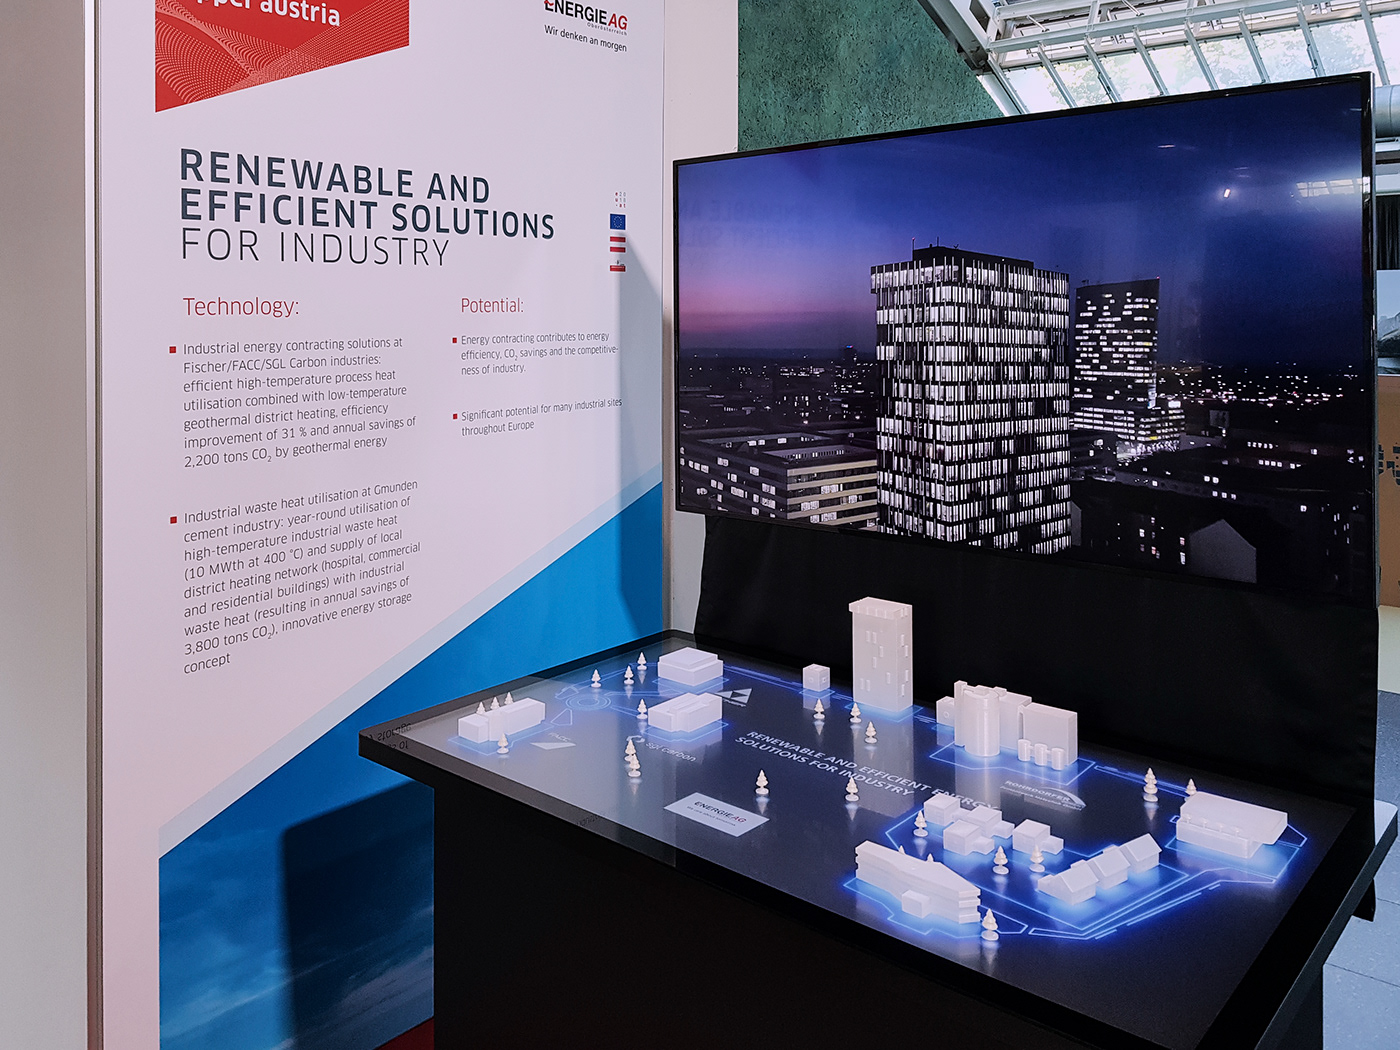 Erneuerbare Energie industrie 3D Installation 3D PRINTED OBJECTS touchscreen interactive qupik Fair creative technologies Renewable Energy